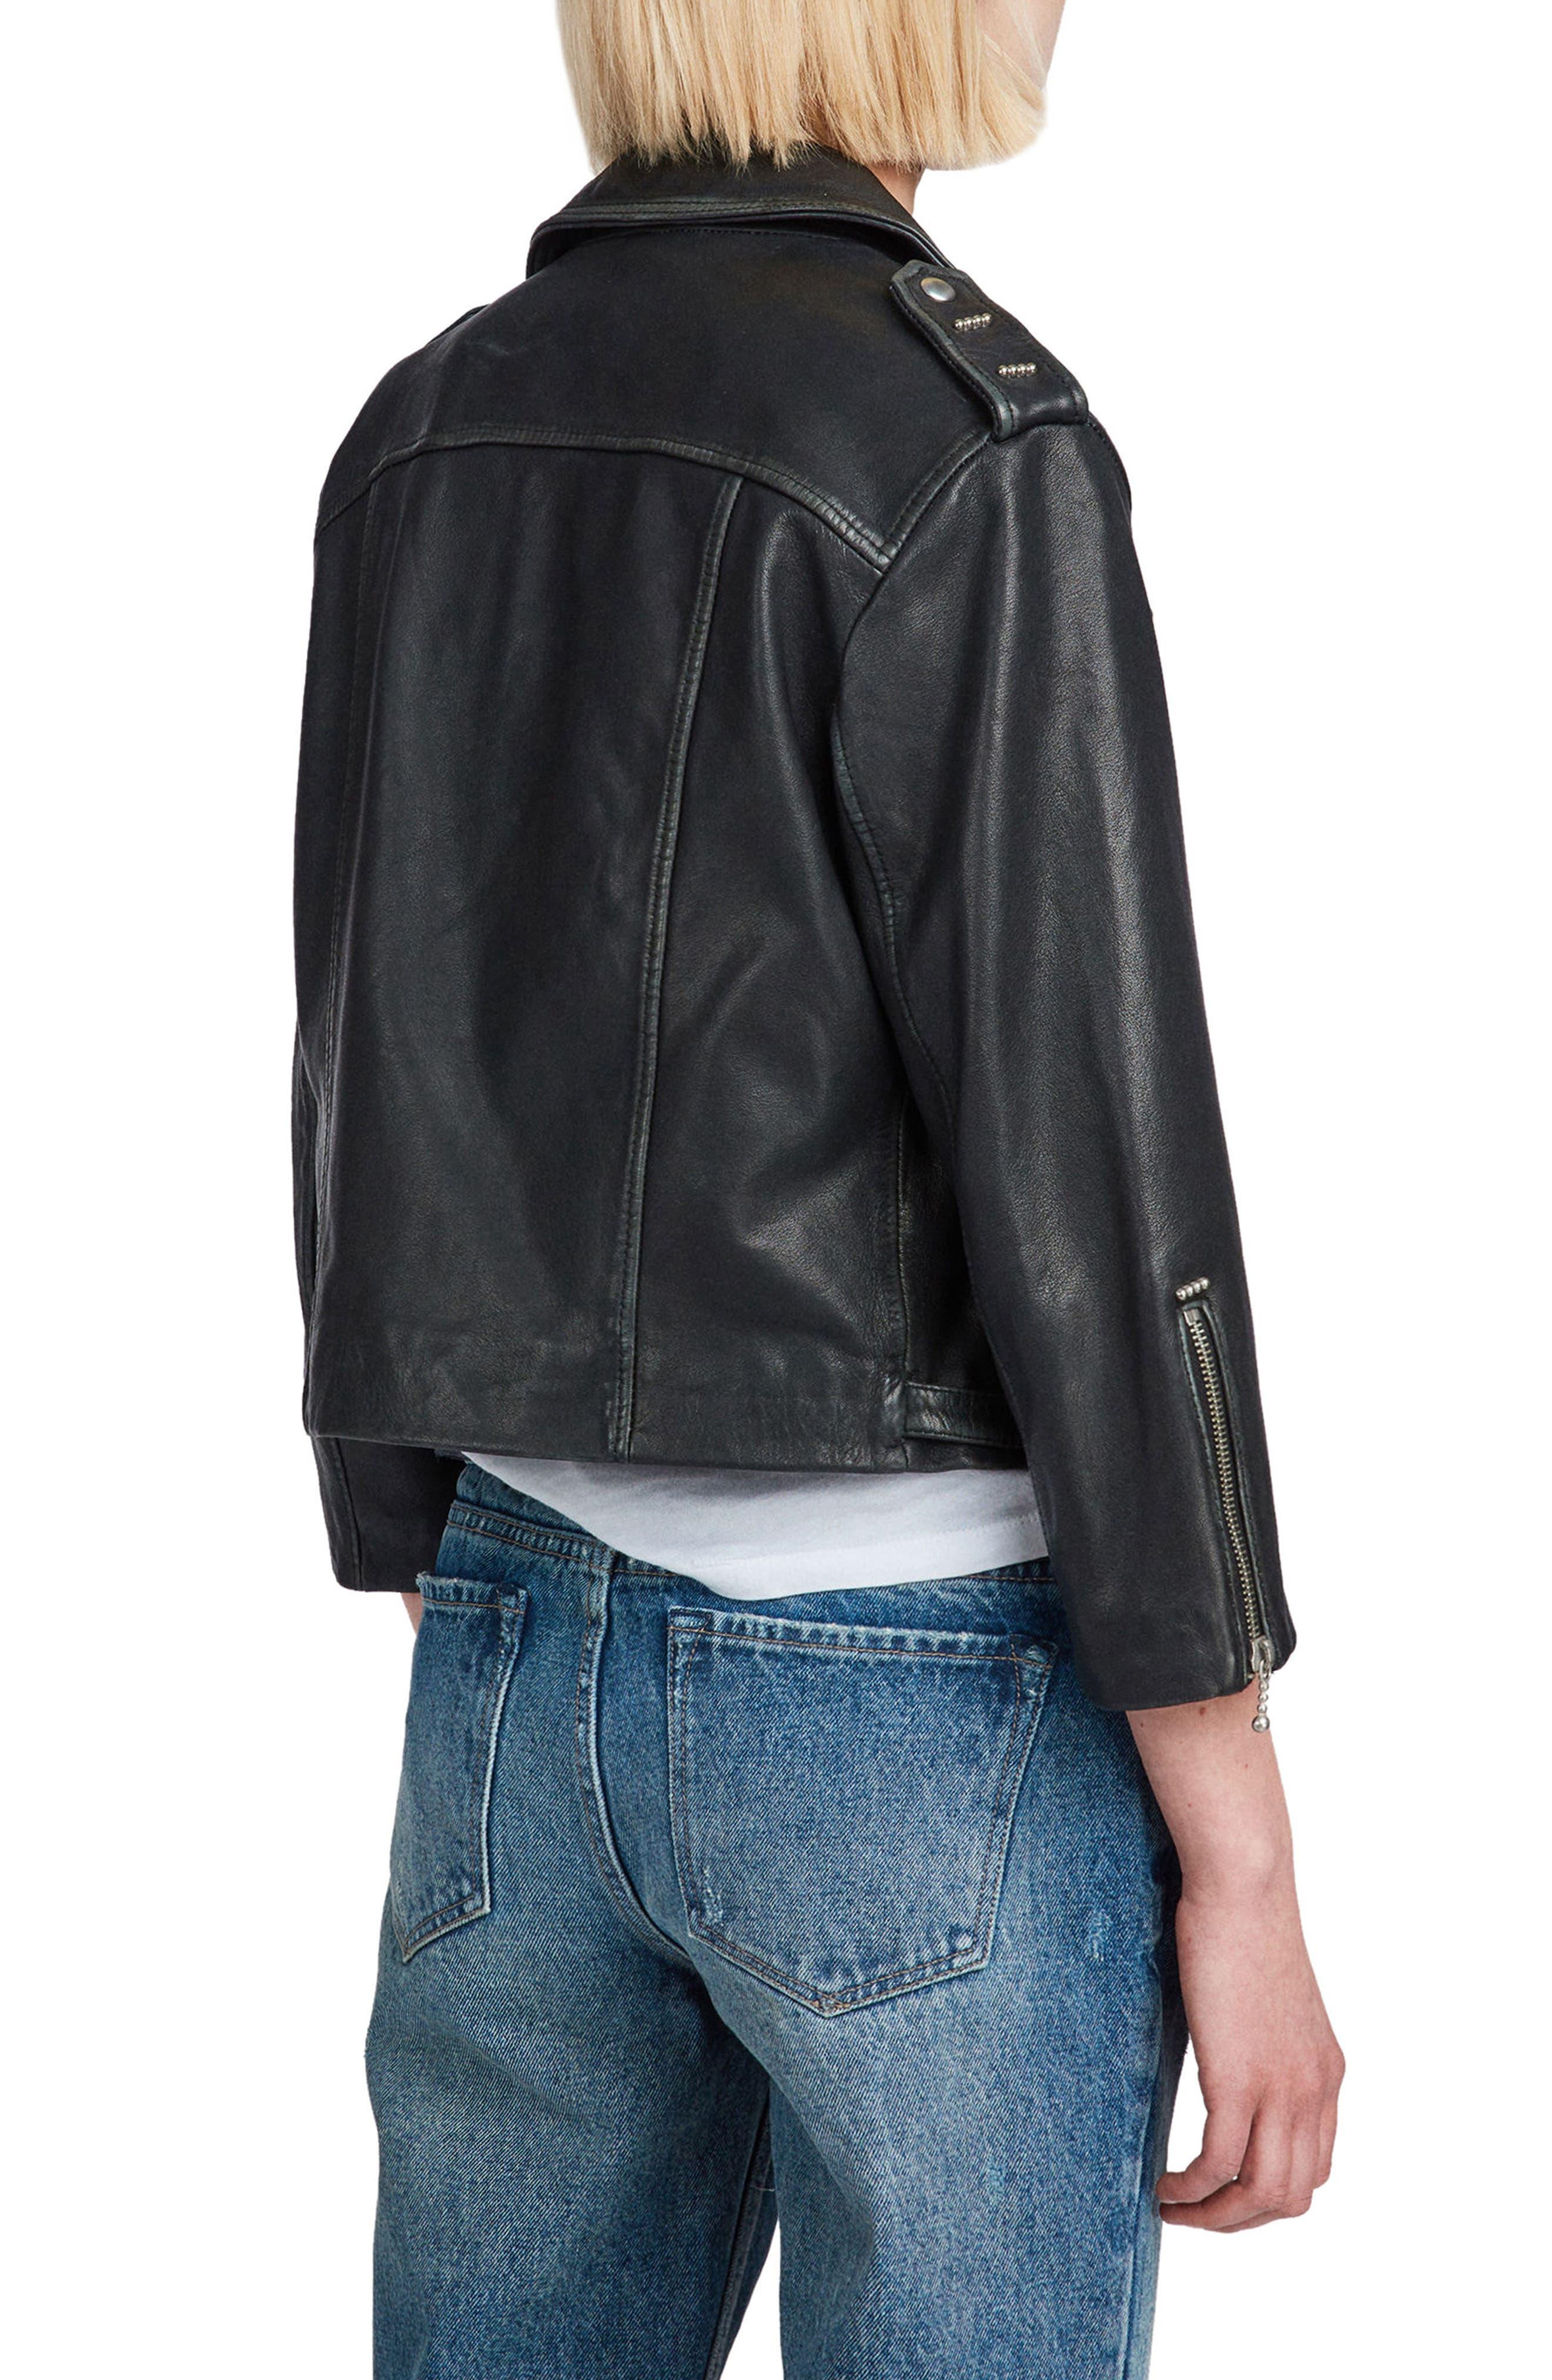 Lara Sheepskin Leather Biker Jacket,                             Alternate thumbnail 2, color,                             001